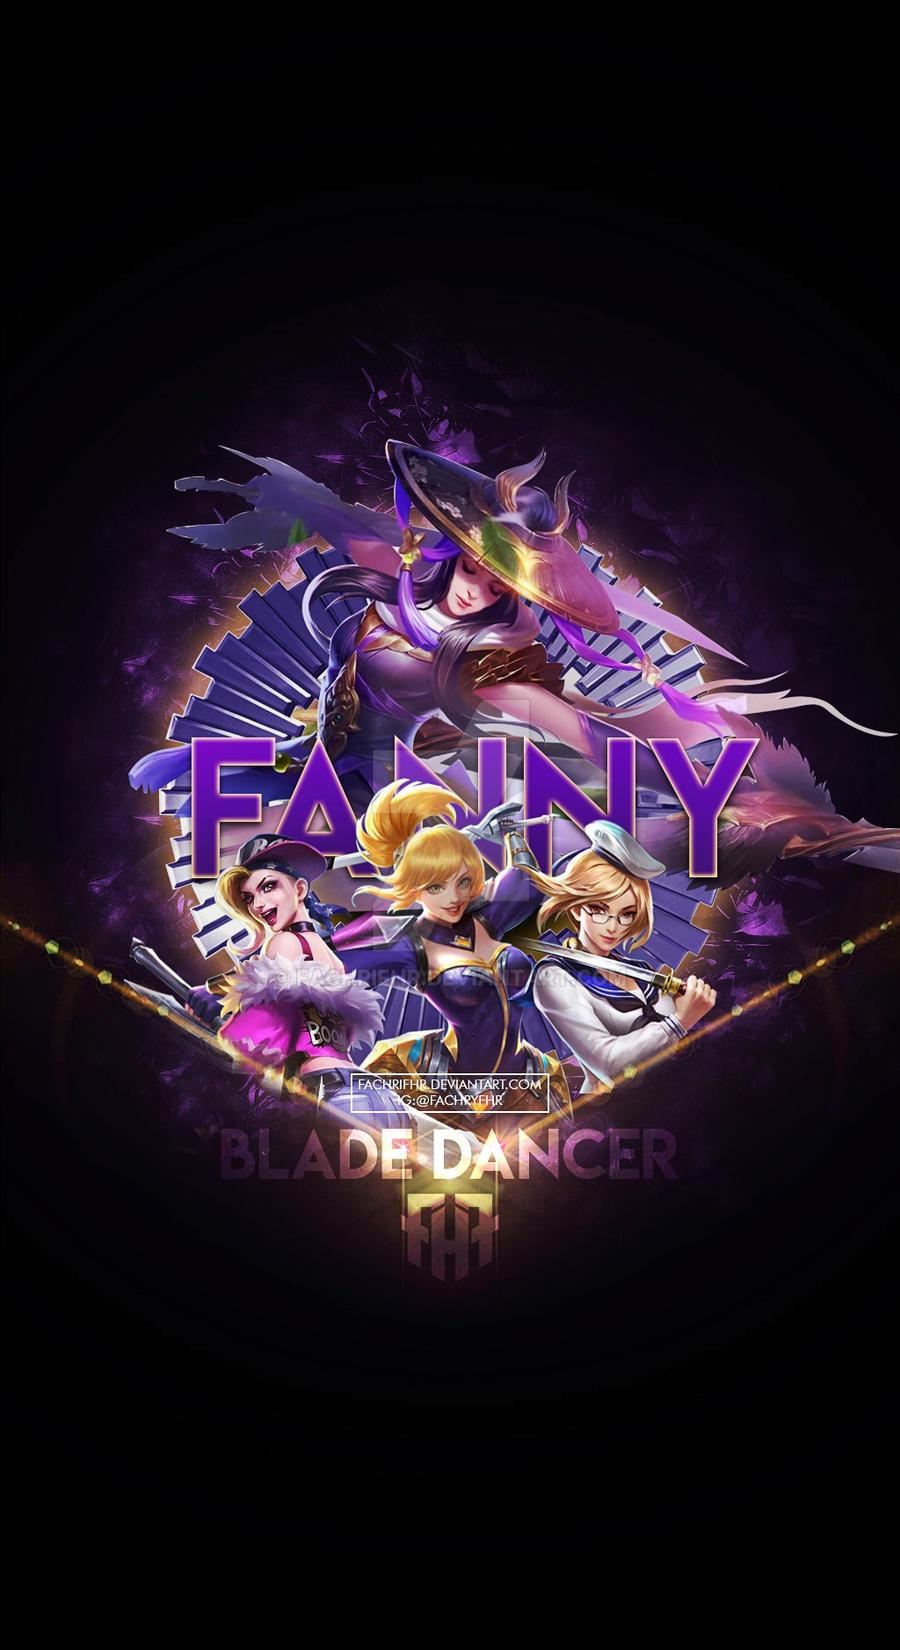 Wallpaper Phone Special Fanny Blade Dancer